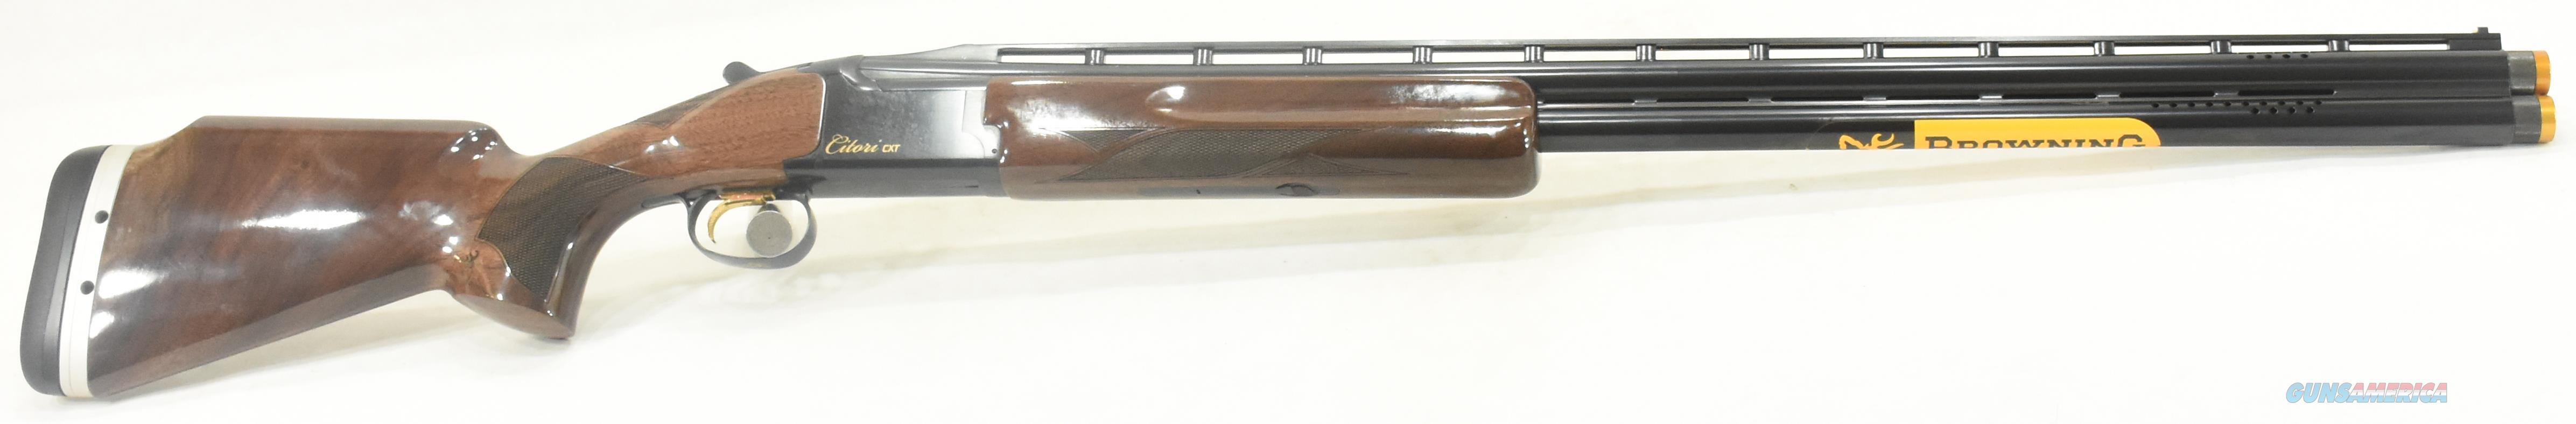 Citori CXT Micro LOP 12Ga 30-3In 018164326  Guns > Shotguns > Browning Shotguns > Over Unders > Citori > Hunting